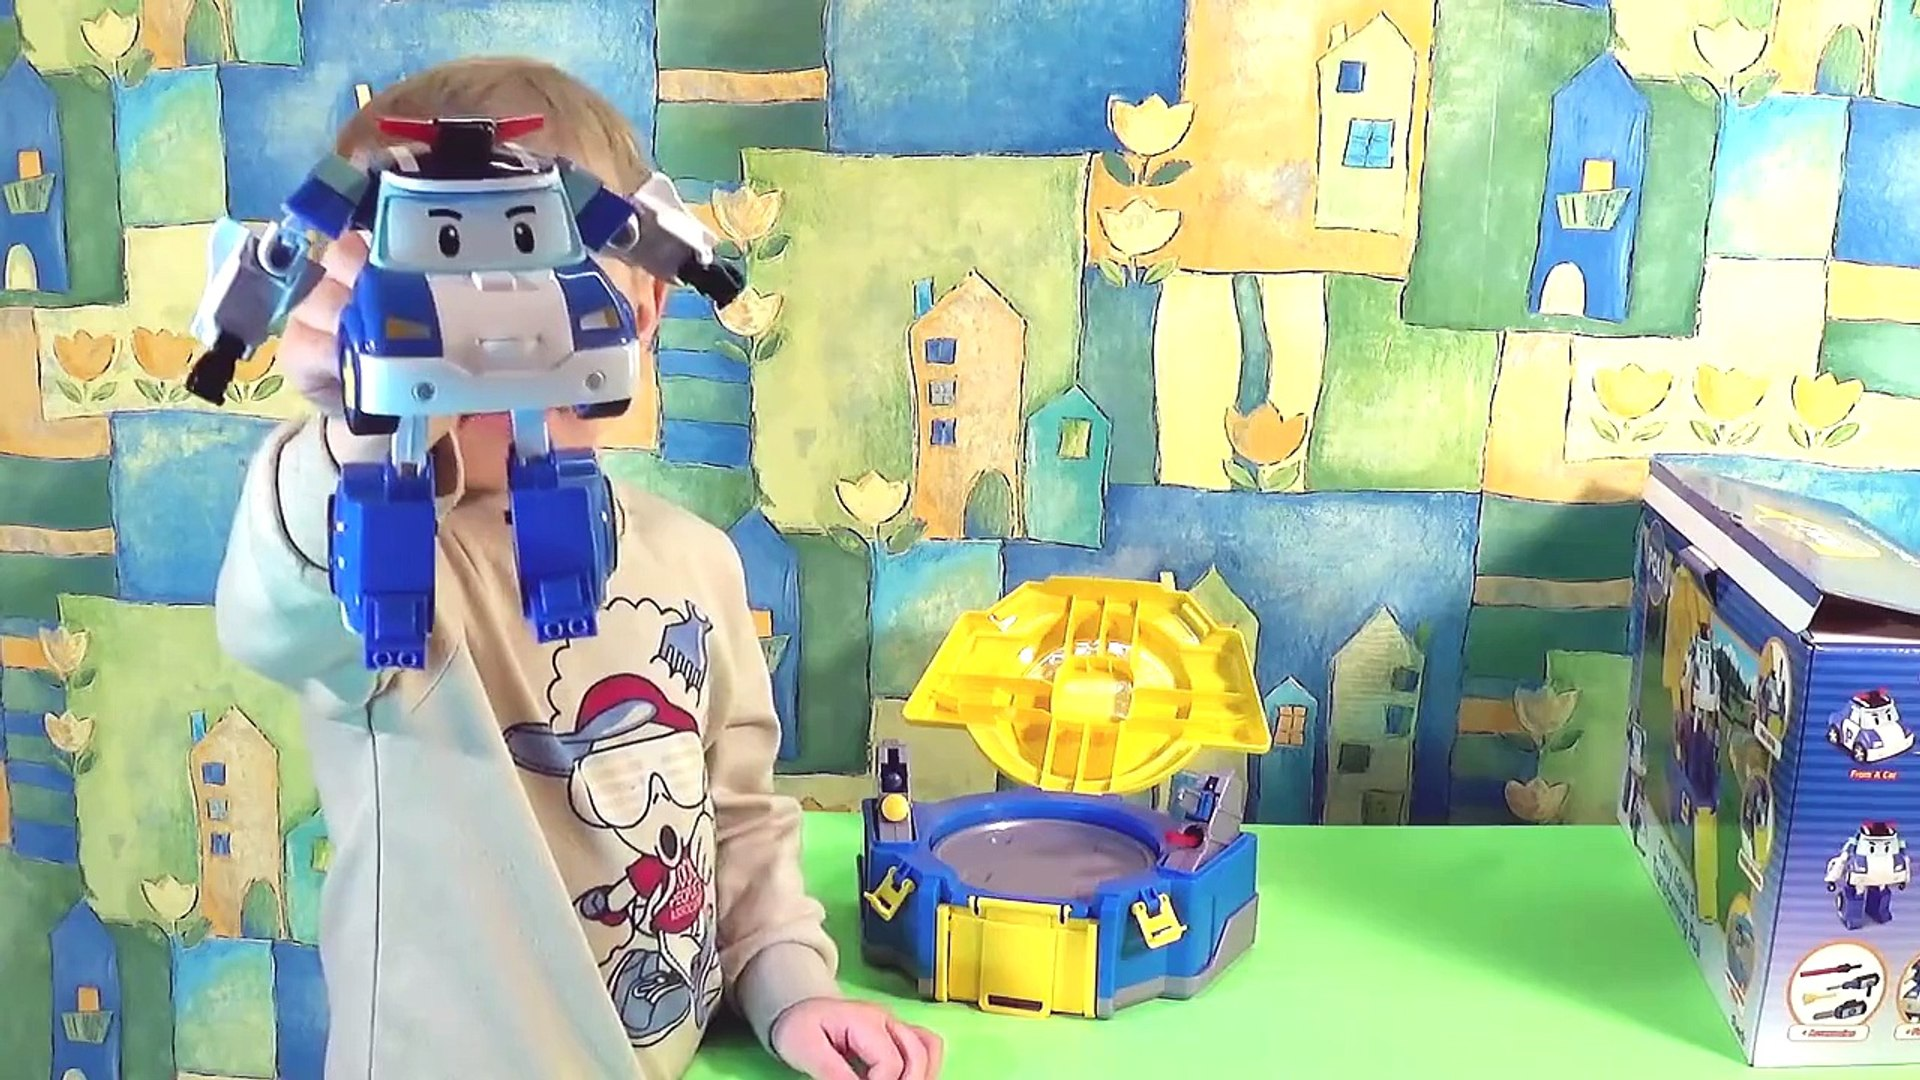 Robocar Poli Led Transforming Playset Poli and little boy Danik. Робокар Поли